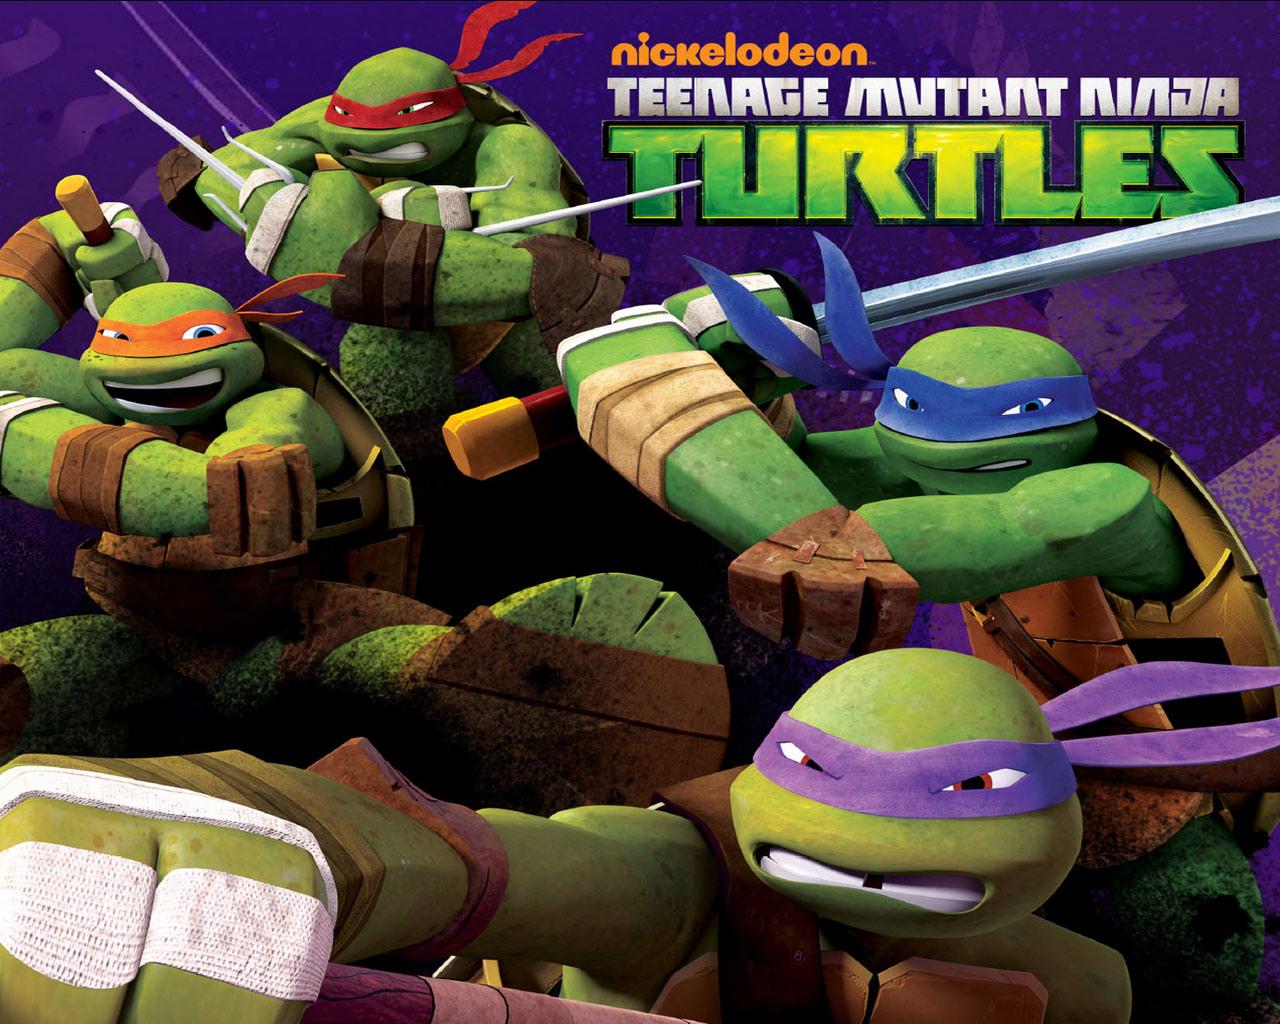 IPhone S Teenage Mutant Ninja Turtles Wallpapers HD Desktop 1280x1024